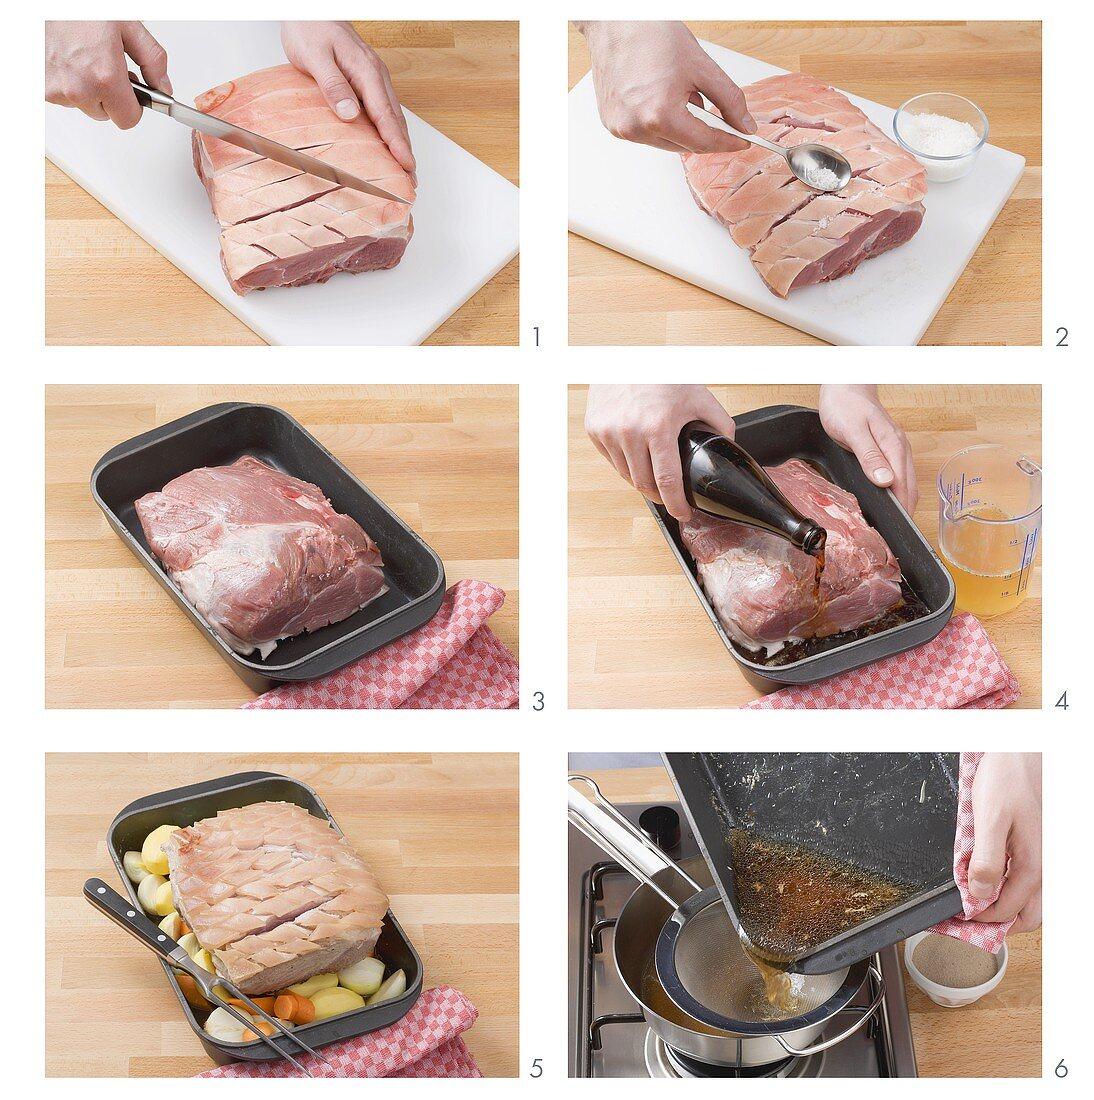 Preparing roast pork with crackling